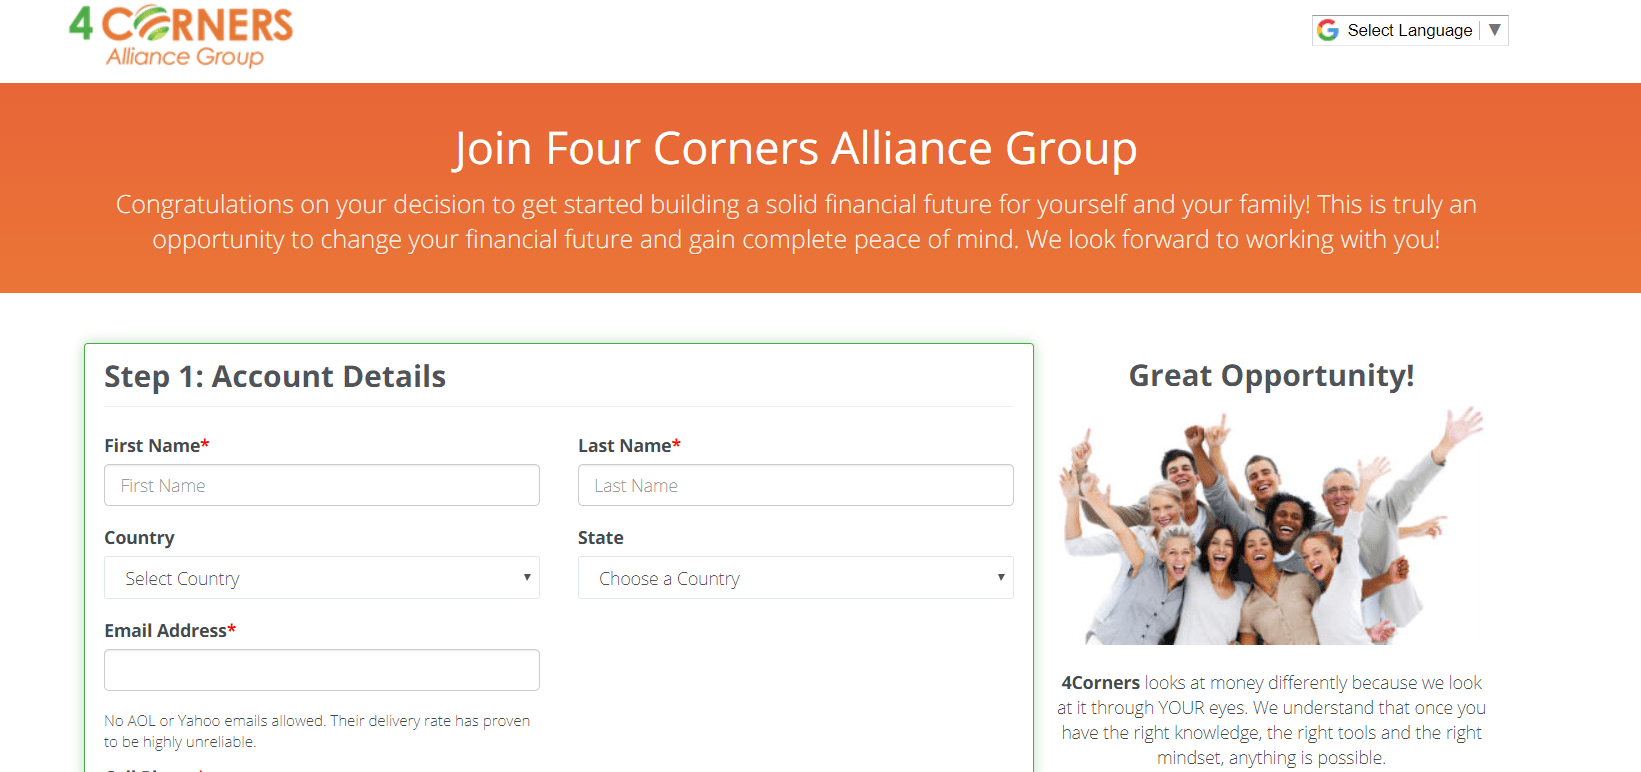 4 corners alliance group website